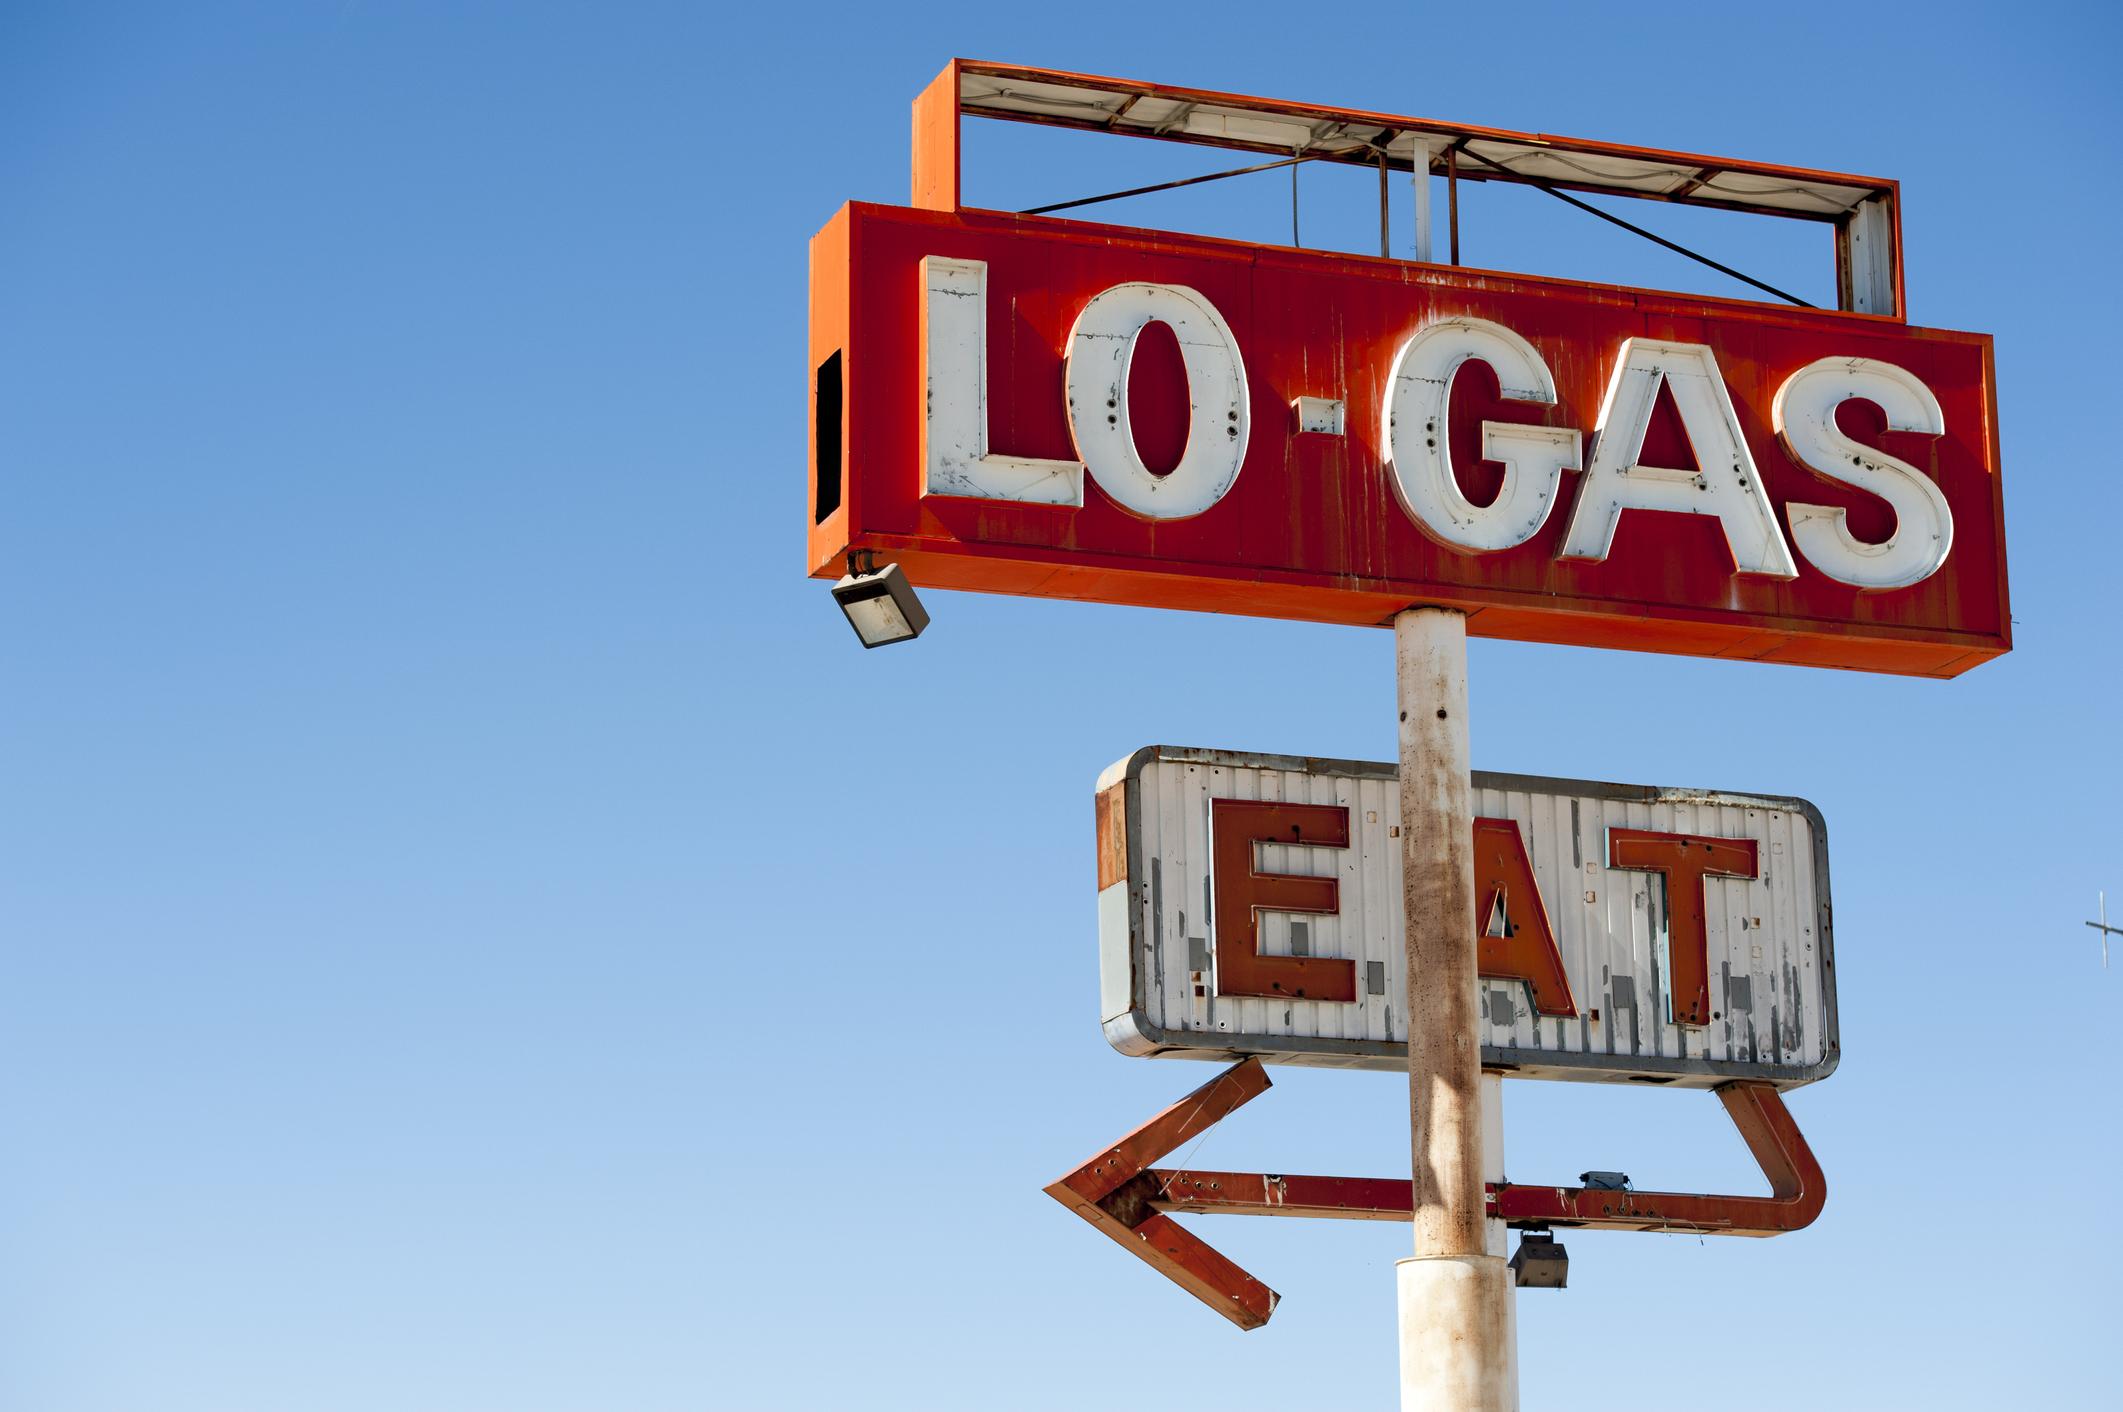 Abandoned gas station sign at Halloran Springs, San Bernardino county, California, USA